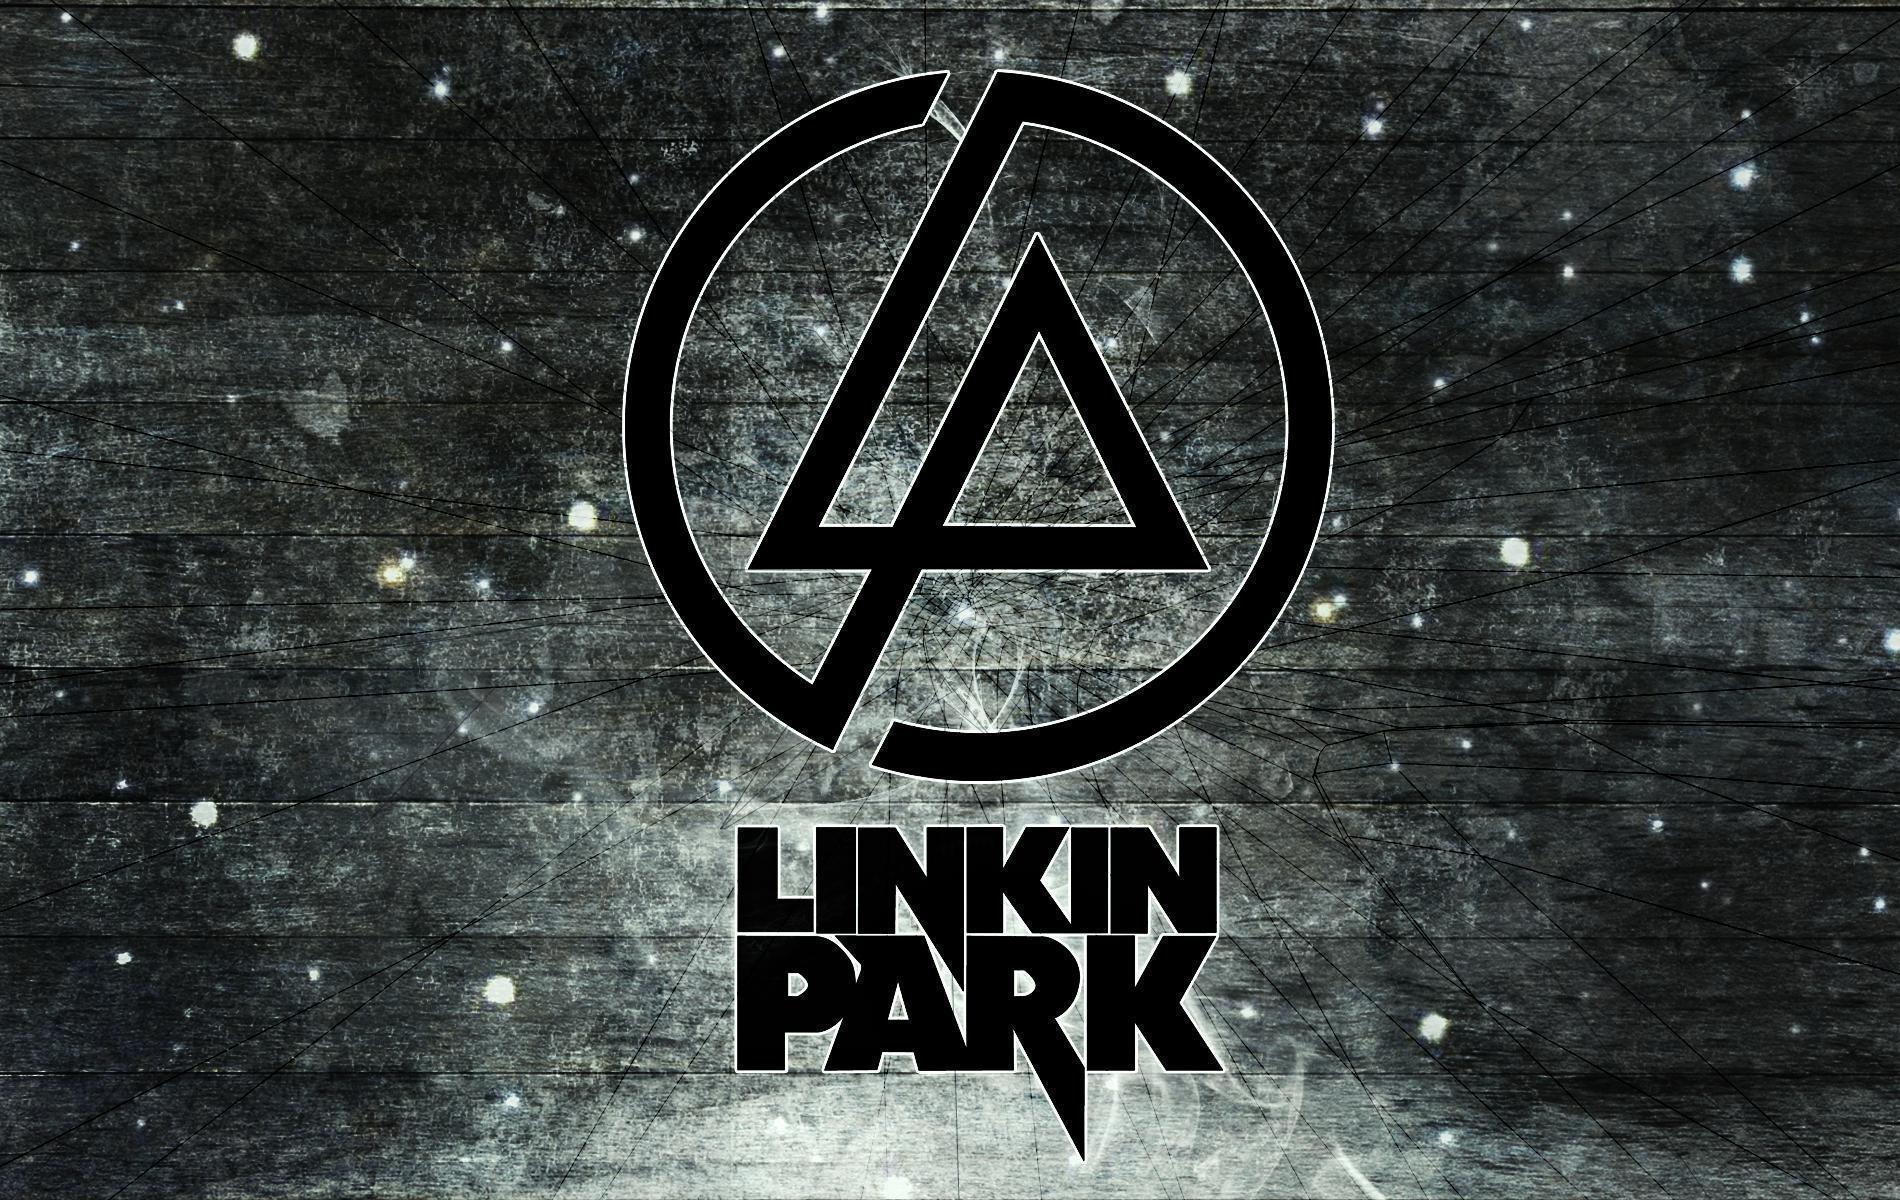 linkin park logo wallpapers 2016 - wallpaper cave